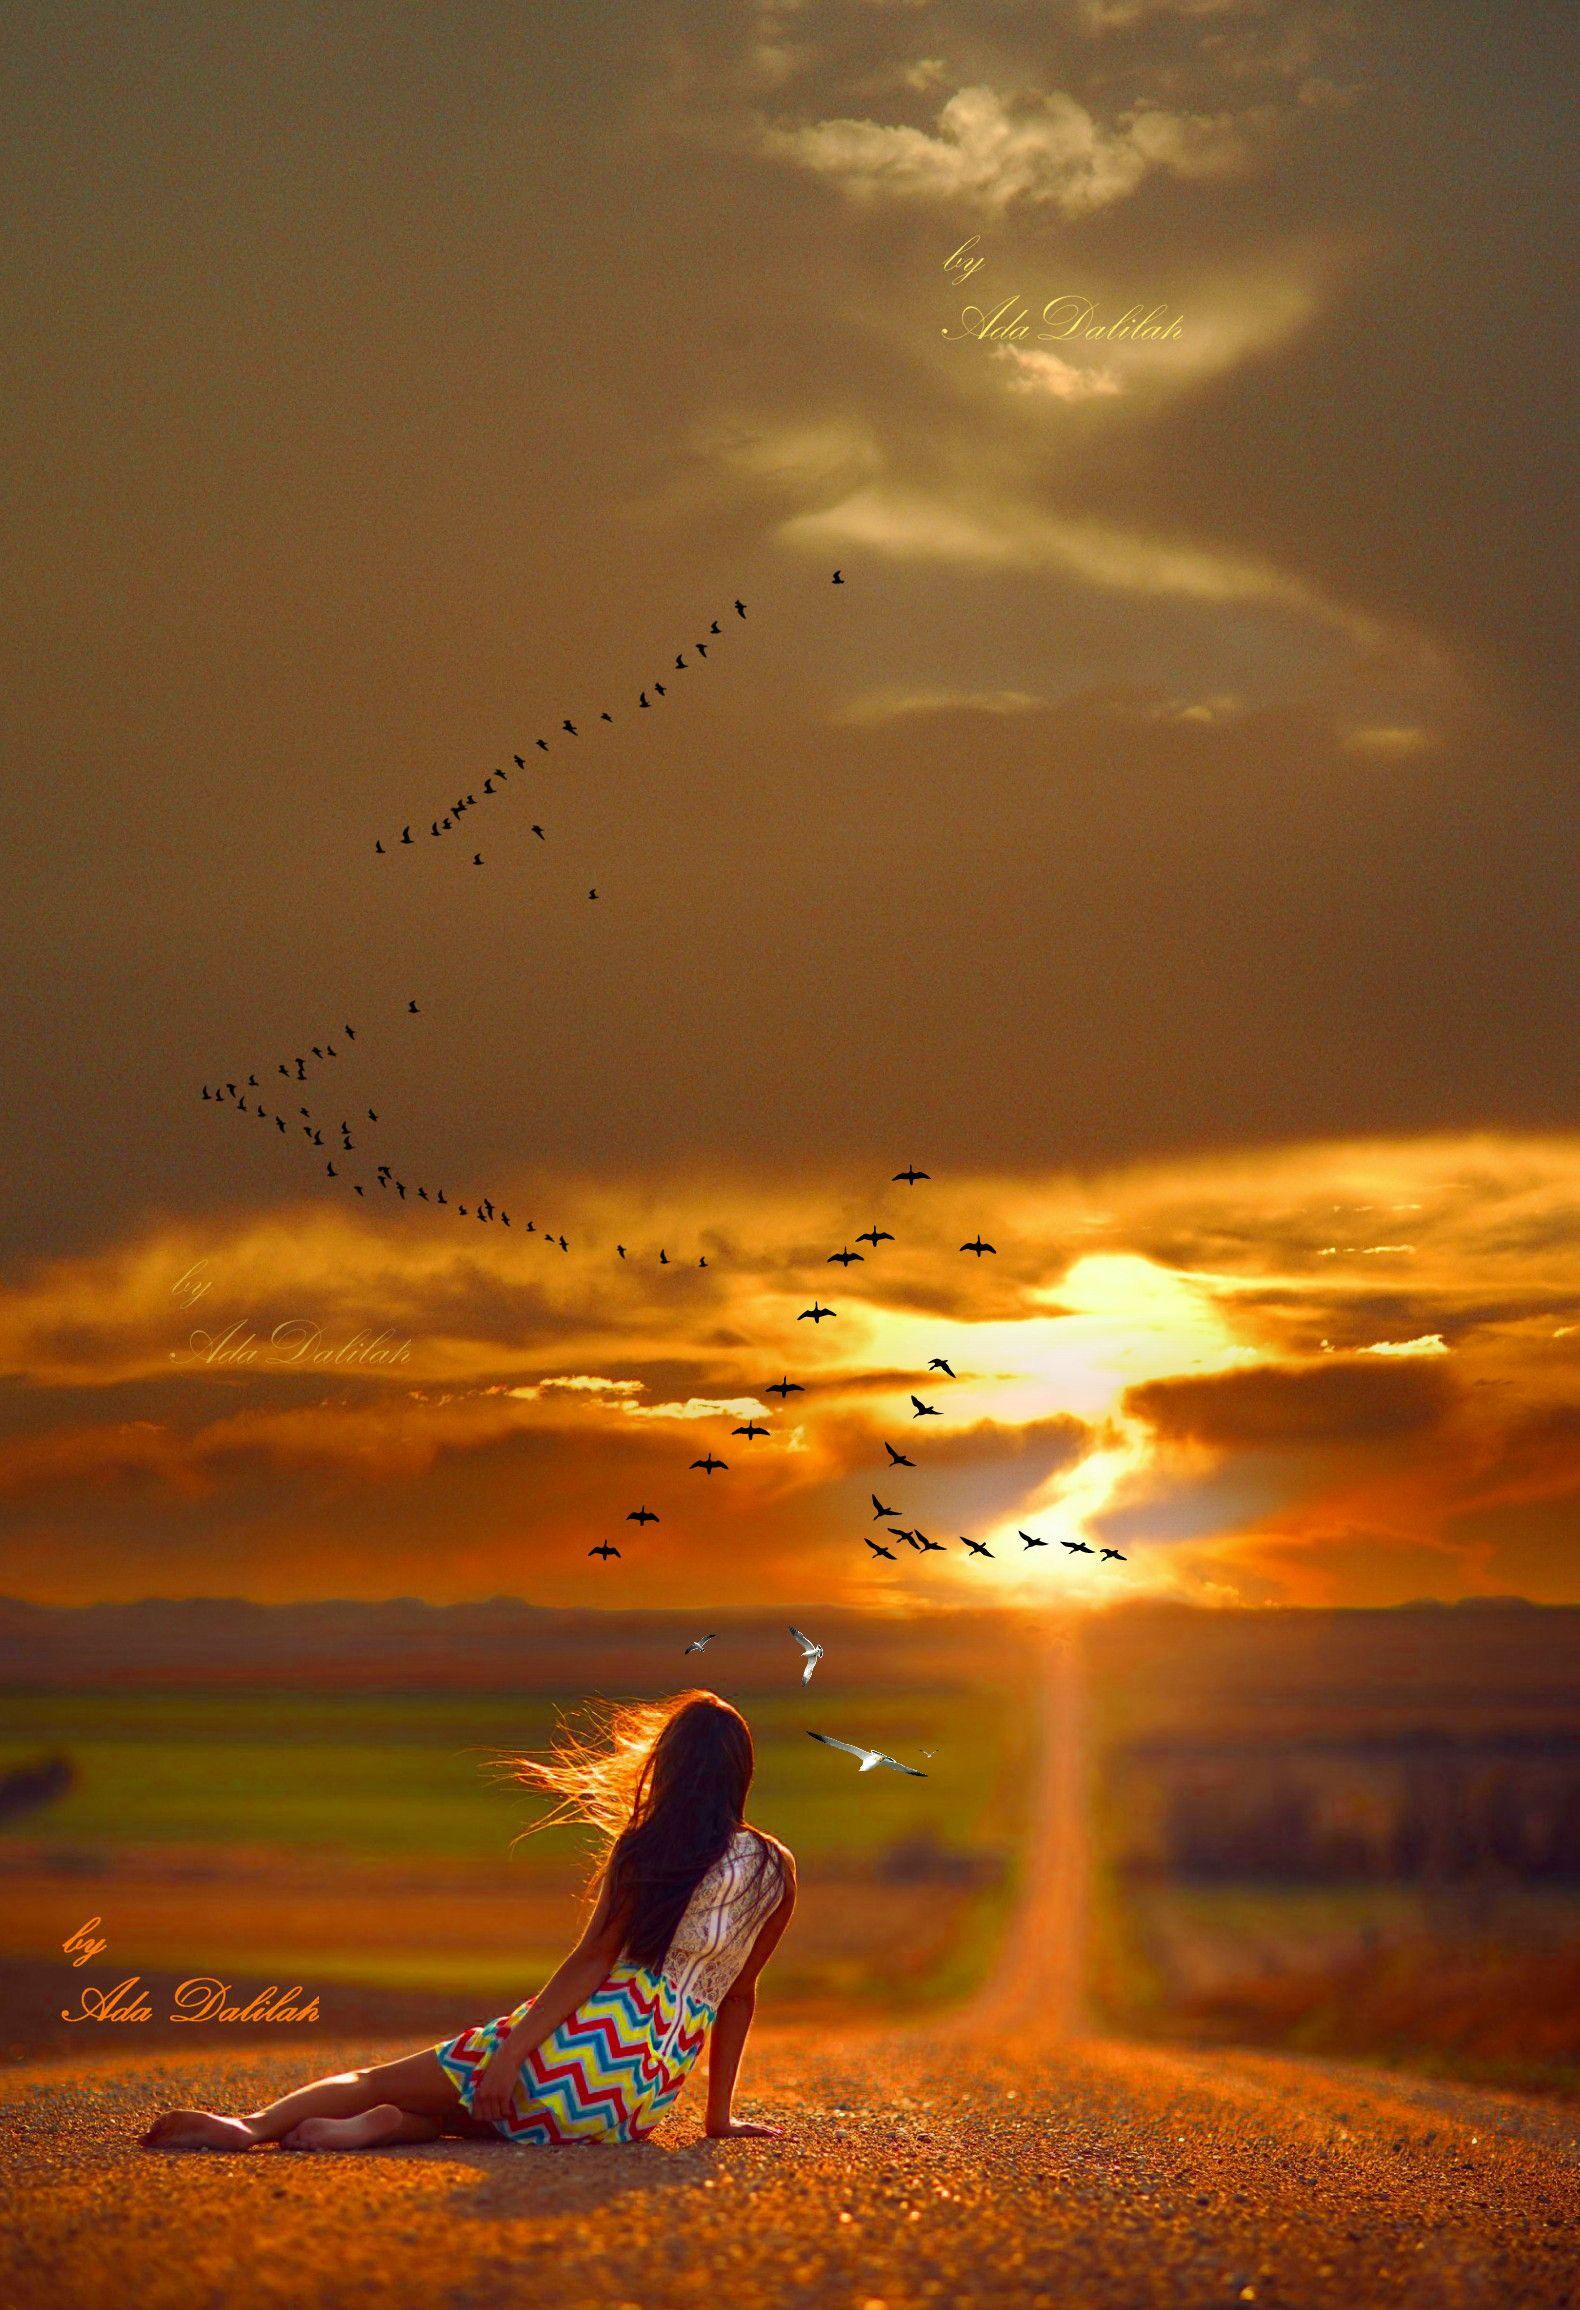 Pin By Michael Delkanic On Ada Dalilah De Todo Un Poco Photo Sunrise Sunset Photomontage